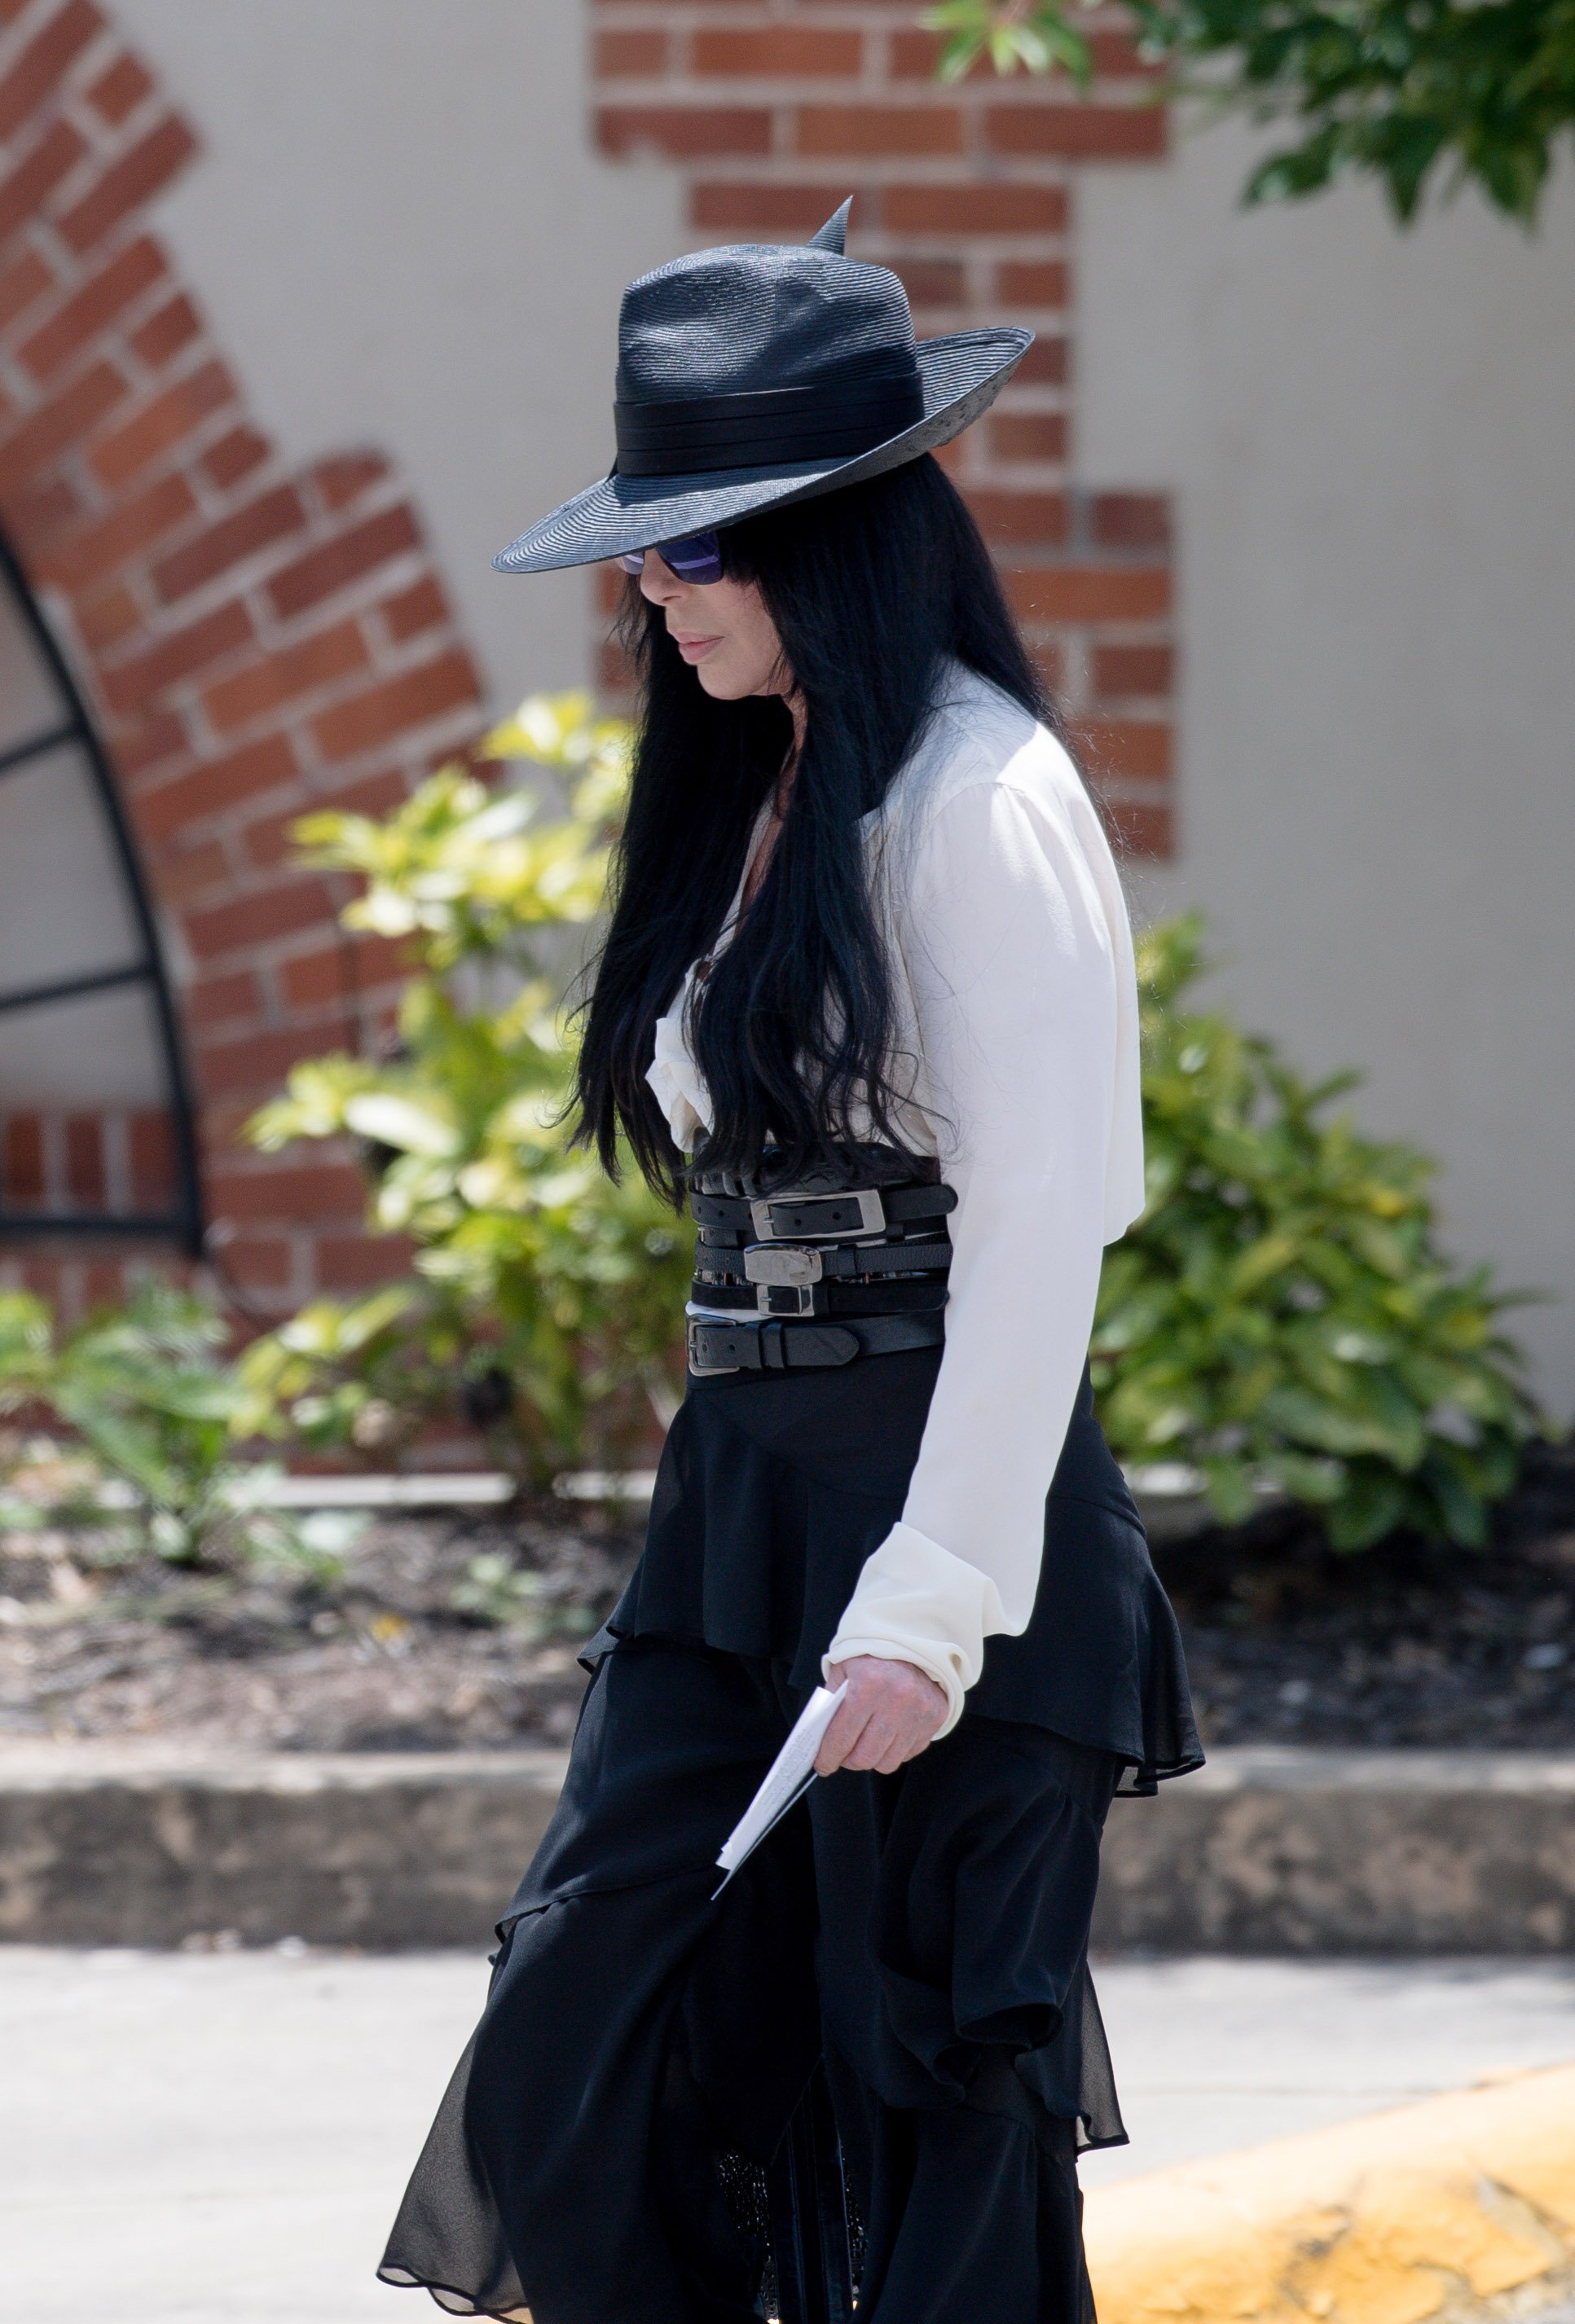 Cher attends the Gregg Allman funeral on June 3, 2017 in Macon, Georgia